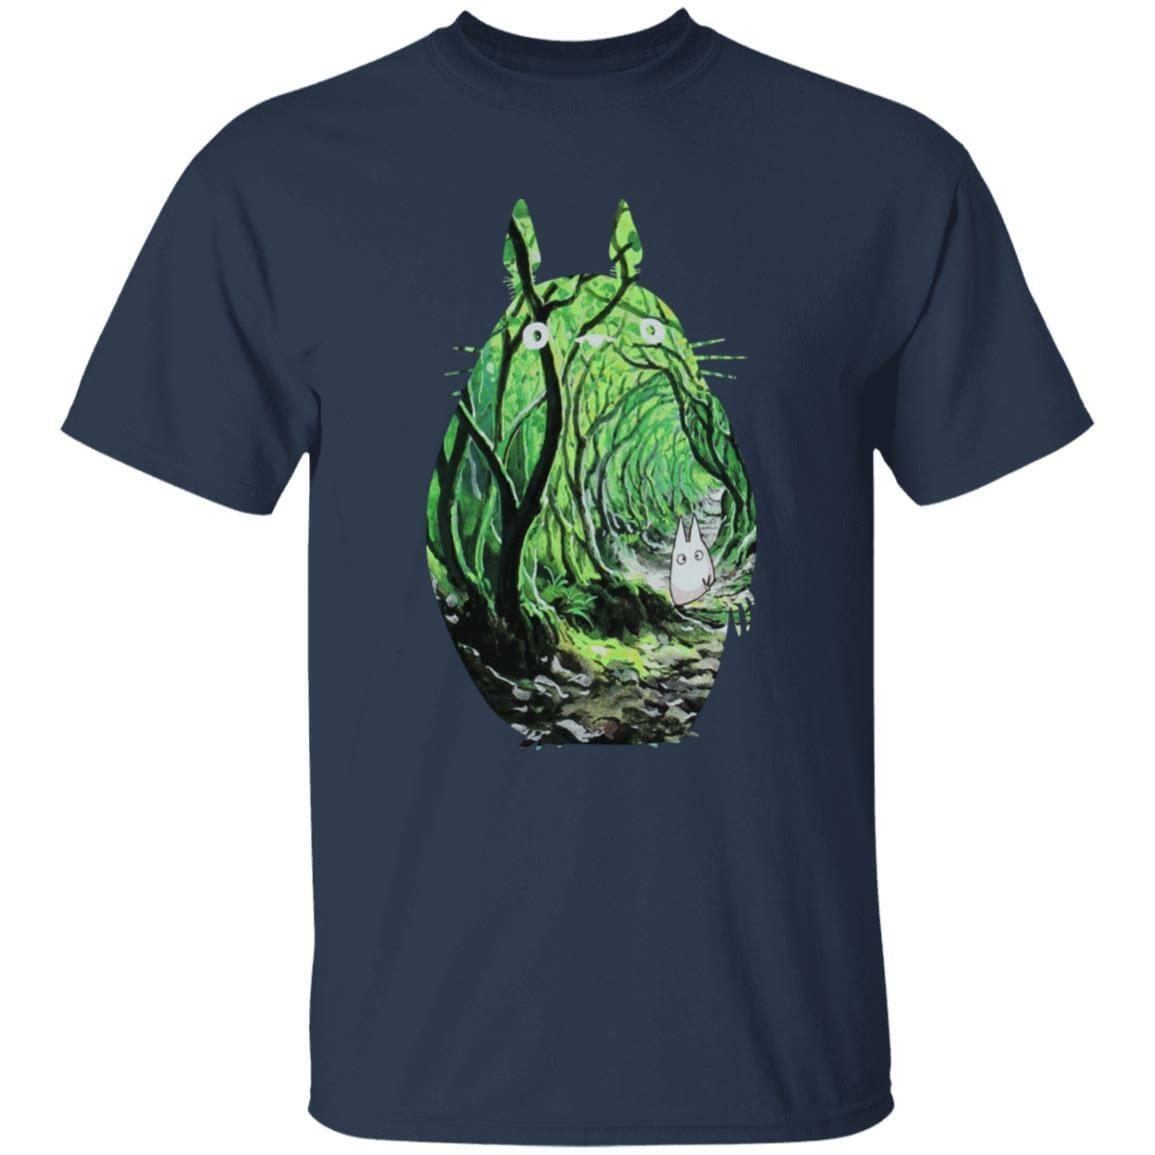 My Neighbor Totoro Forest T Shirt